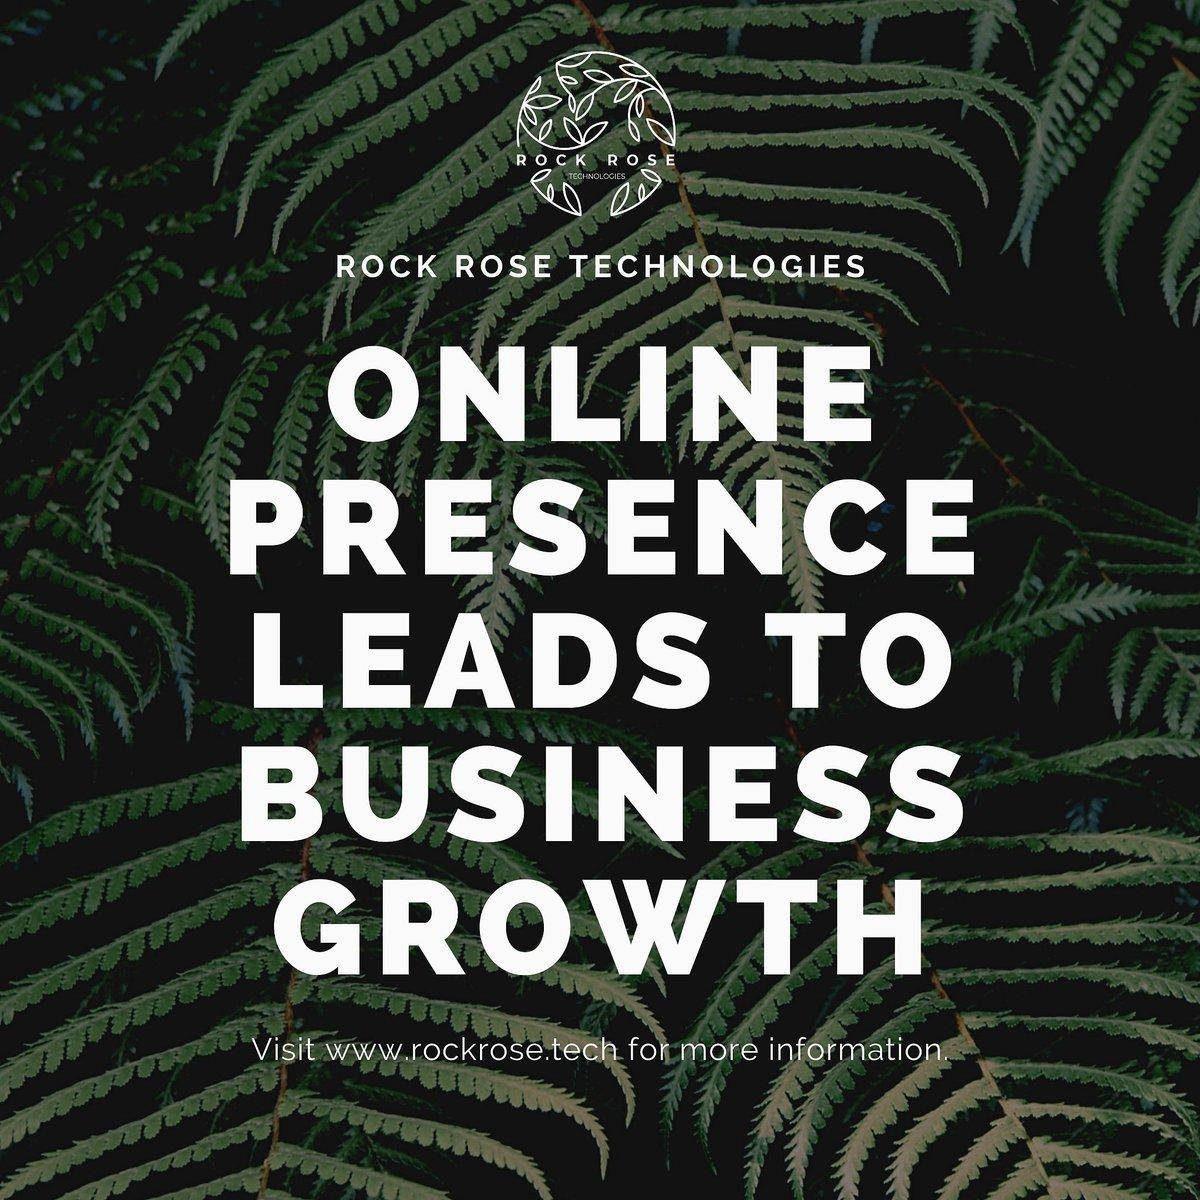 #webdesign #website #websitedesigner #webmarketingtools #webmarketing #webmarketingstrategy #seo #smo #webhostingservice #webhosting #webstagram #ecommercebusiness #ecommerce #fourthindustrialrevolution #smallbusiness #supportsmallbusiness #supportlocal #johannesburg #southafricapic.twitter.com/JZ7Puocg55